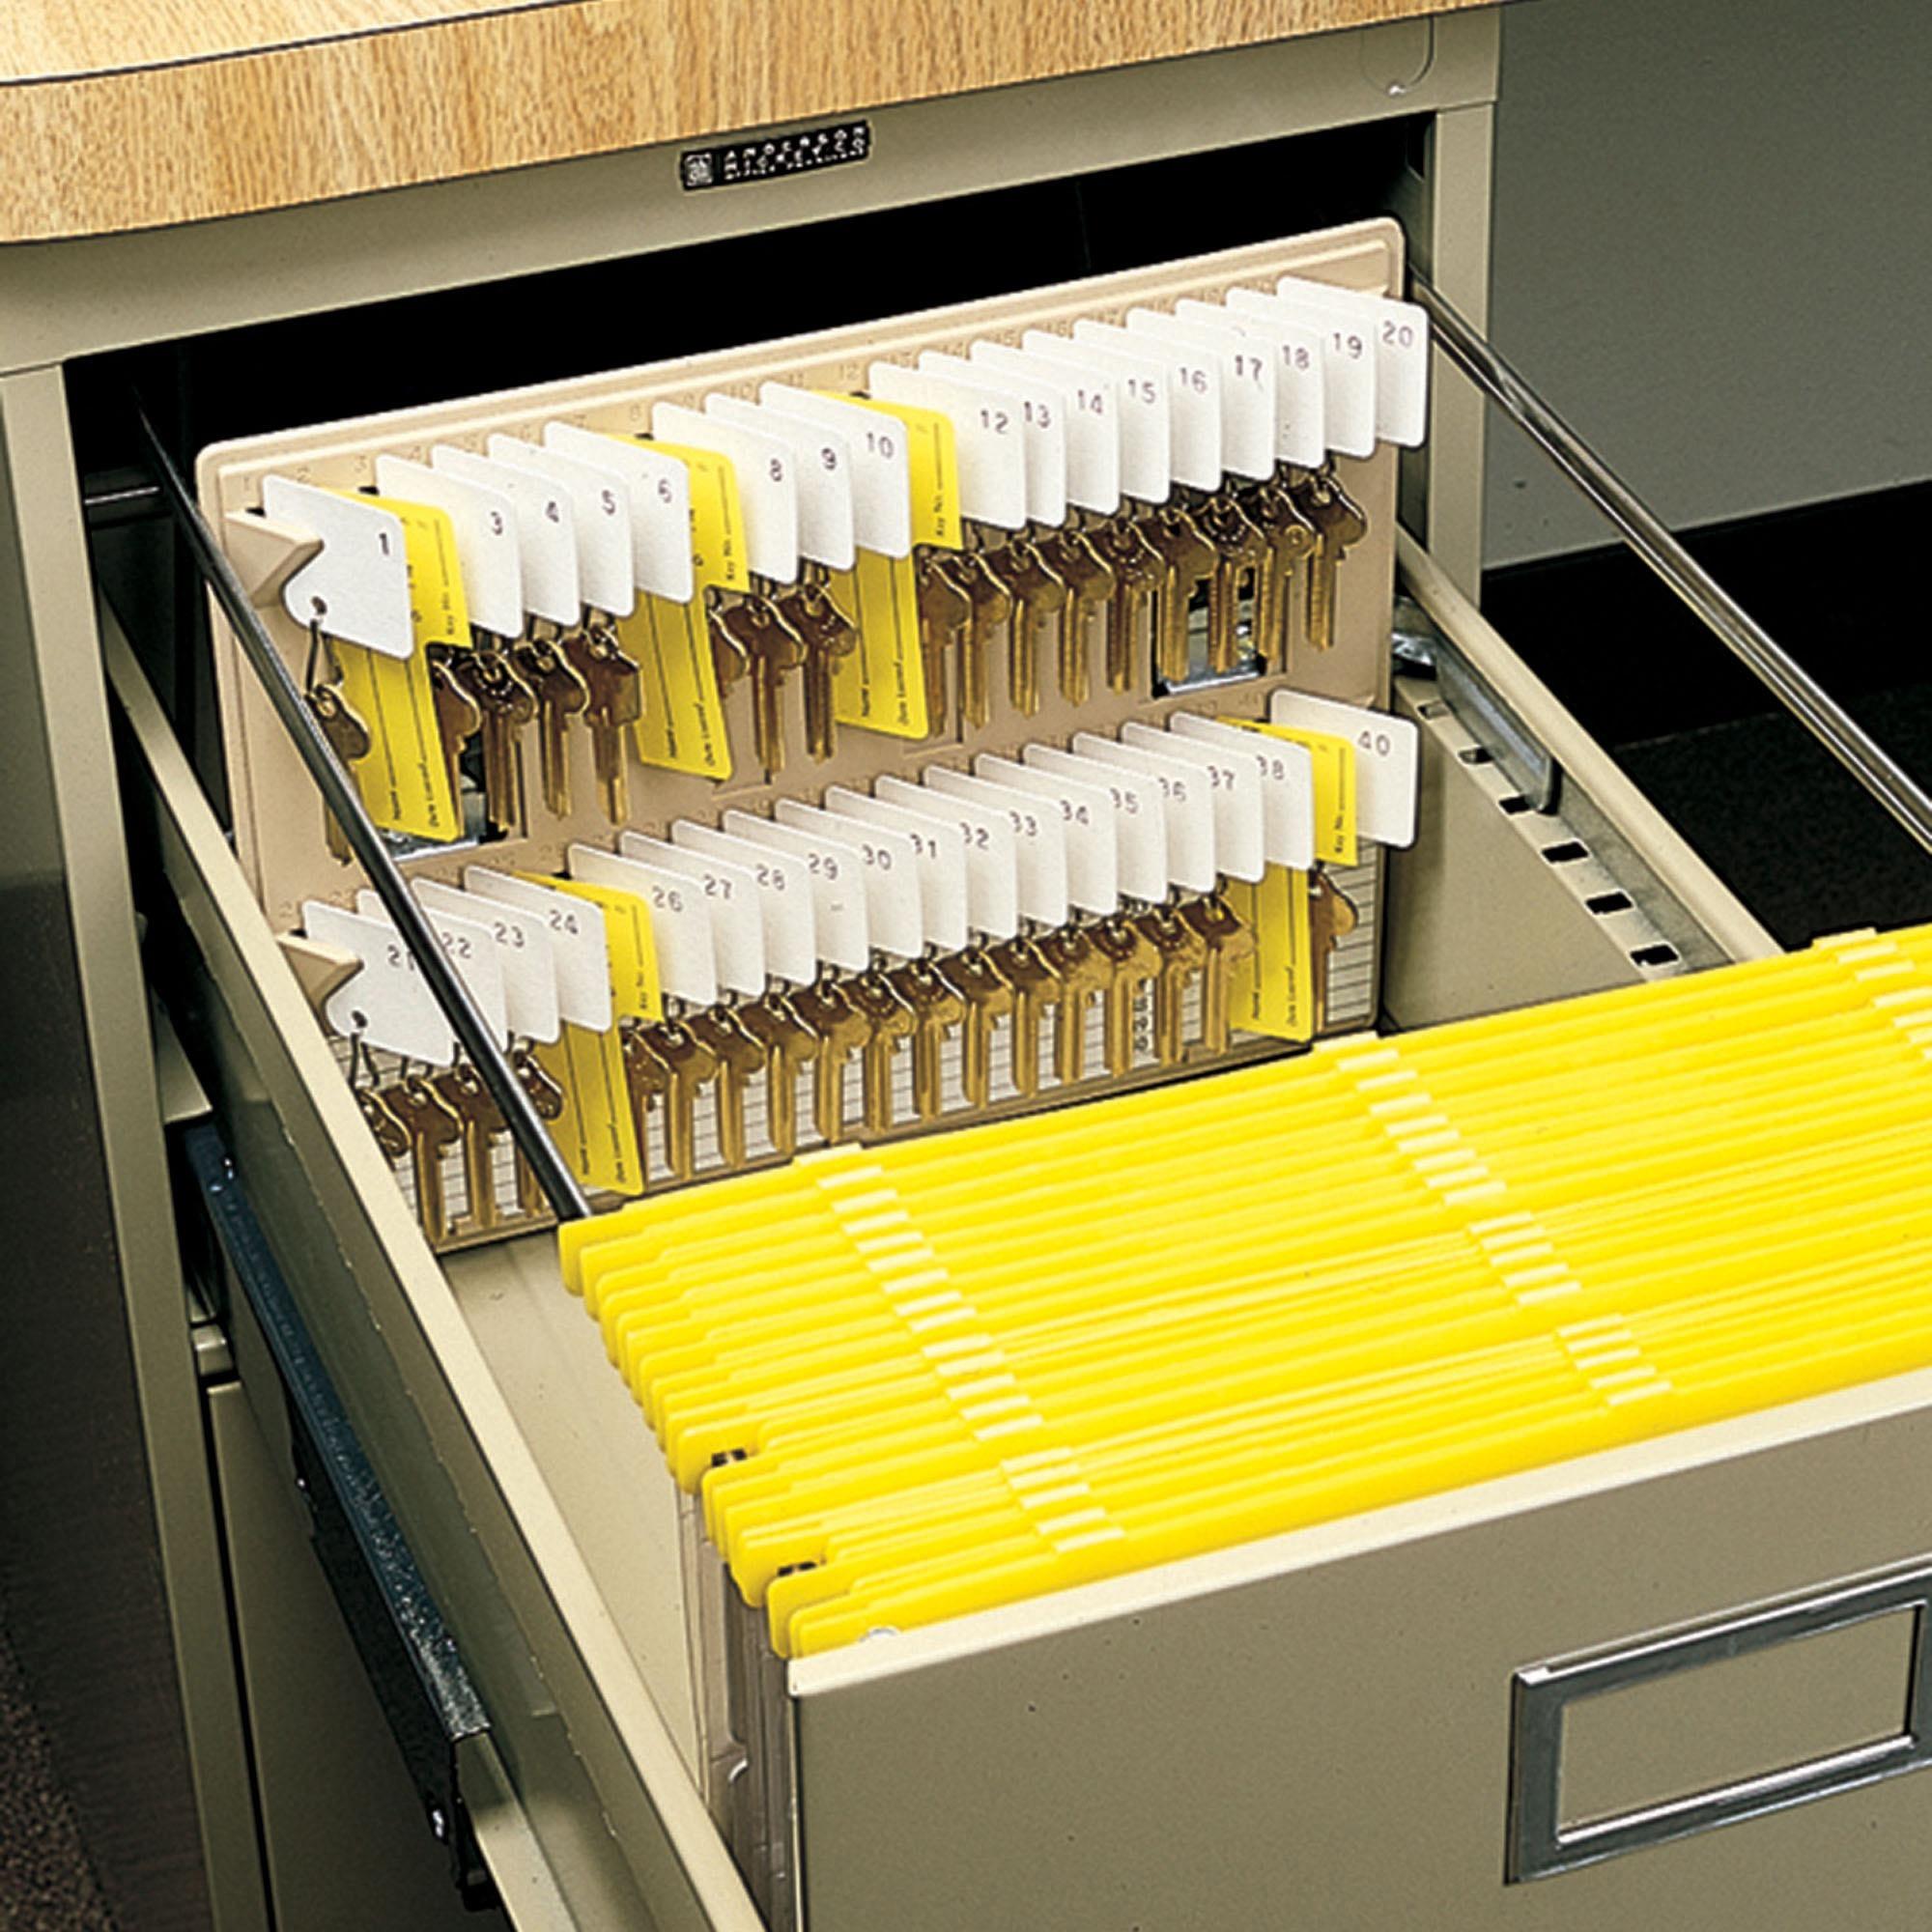 sauder creek shoak products cabinet lateral organizer file drawers drawer